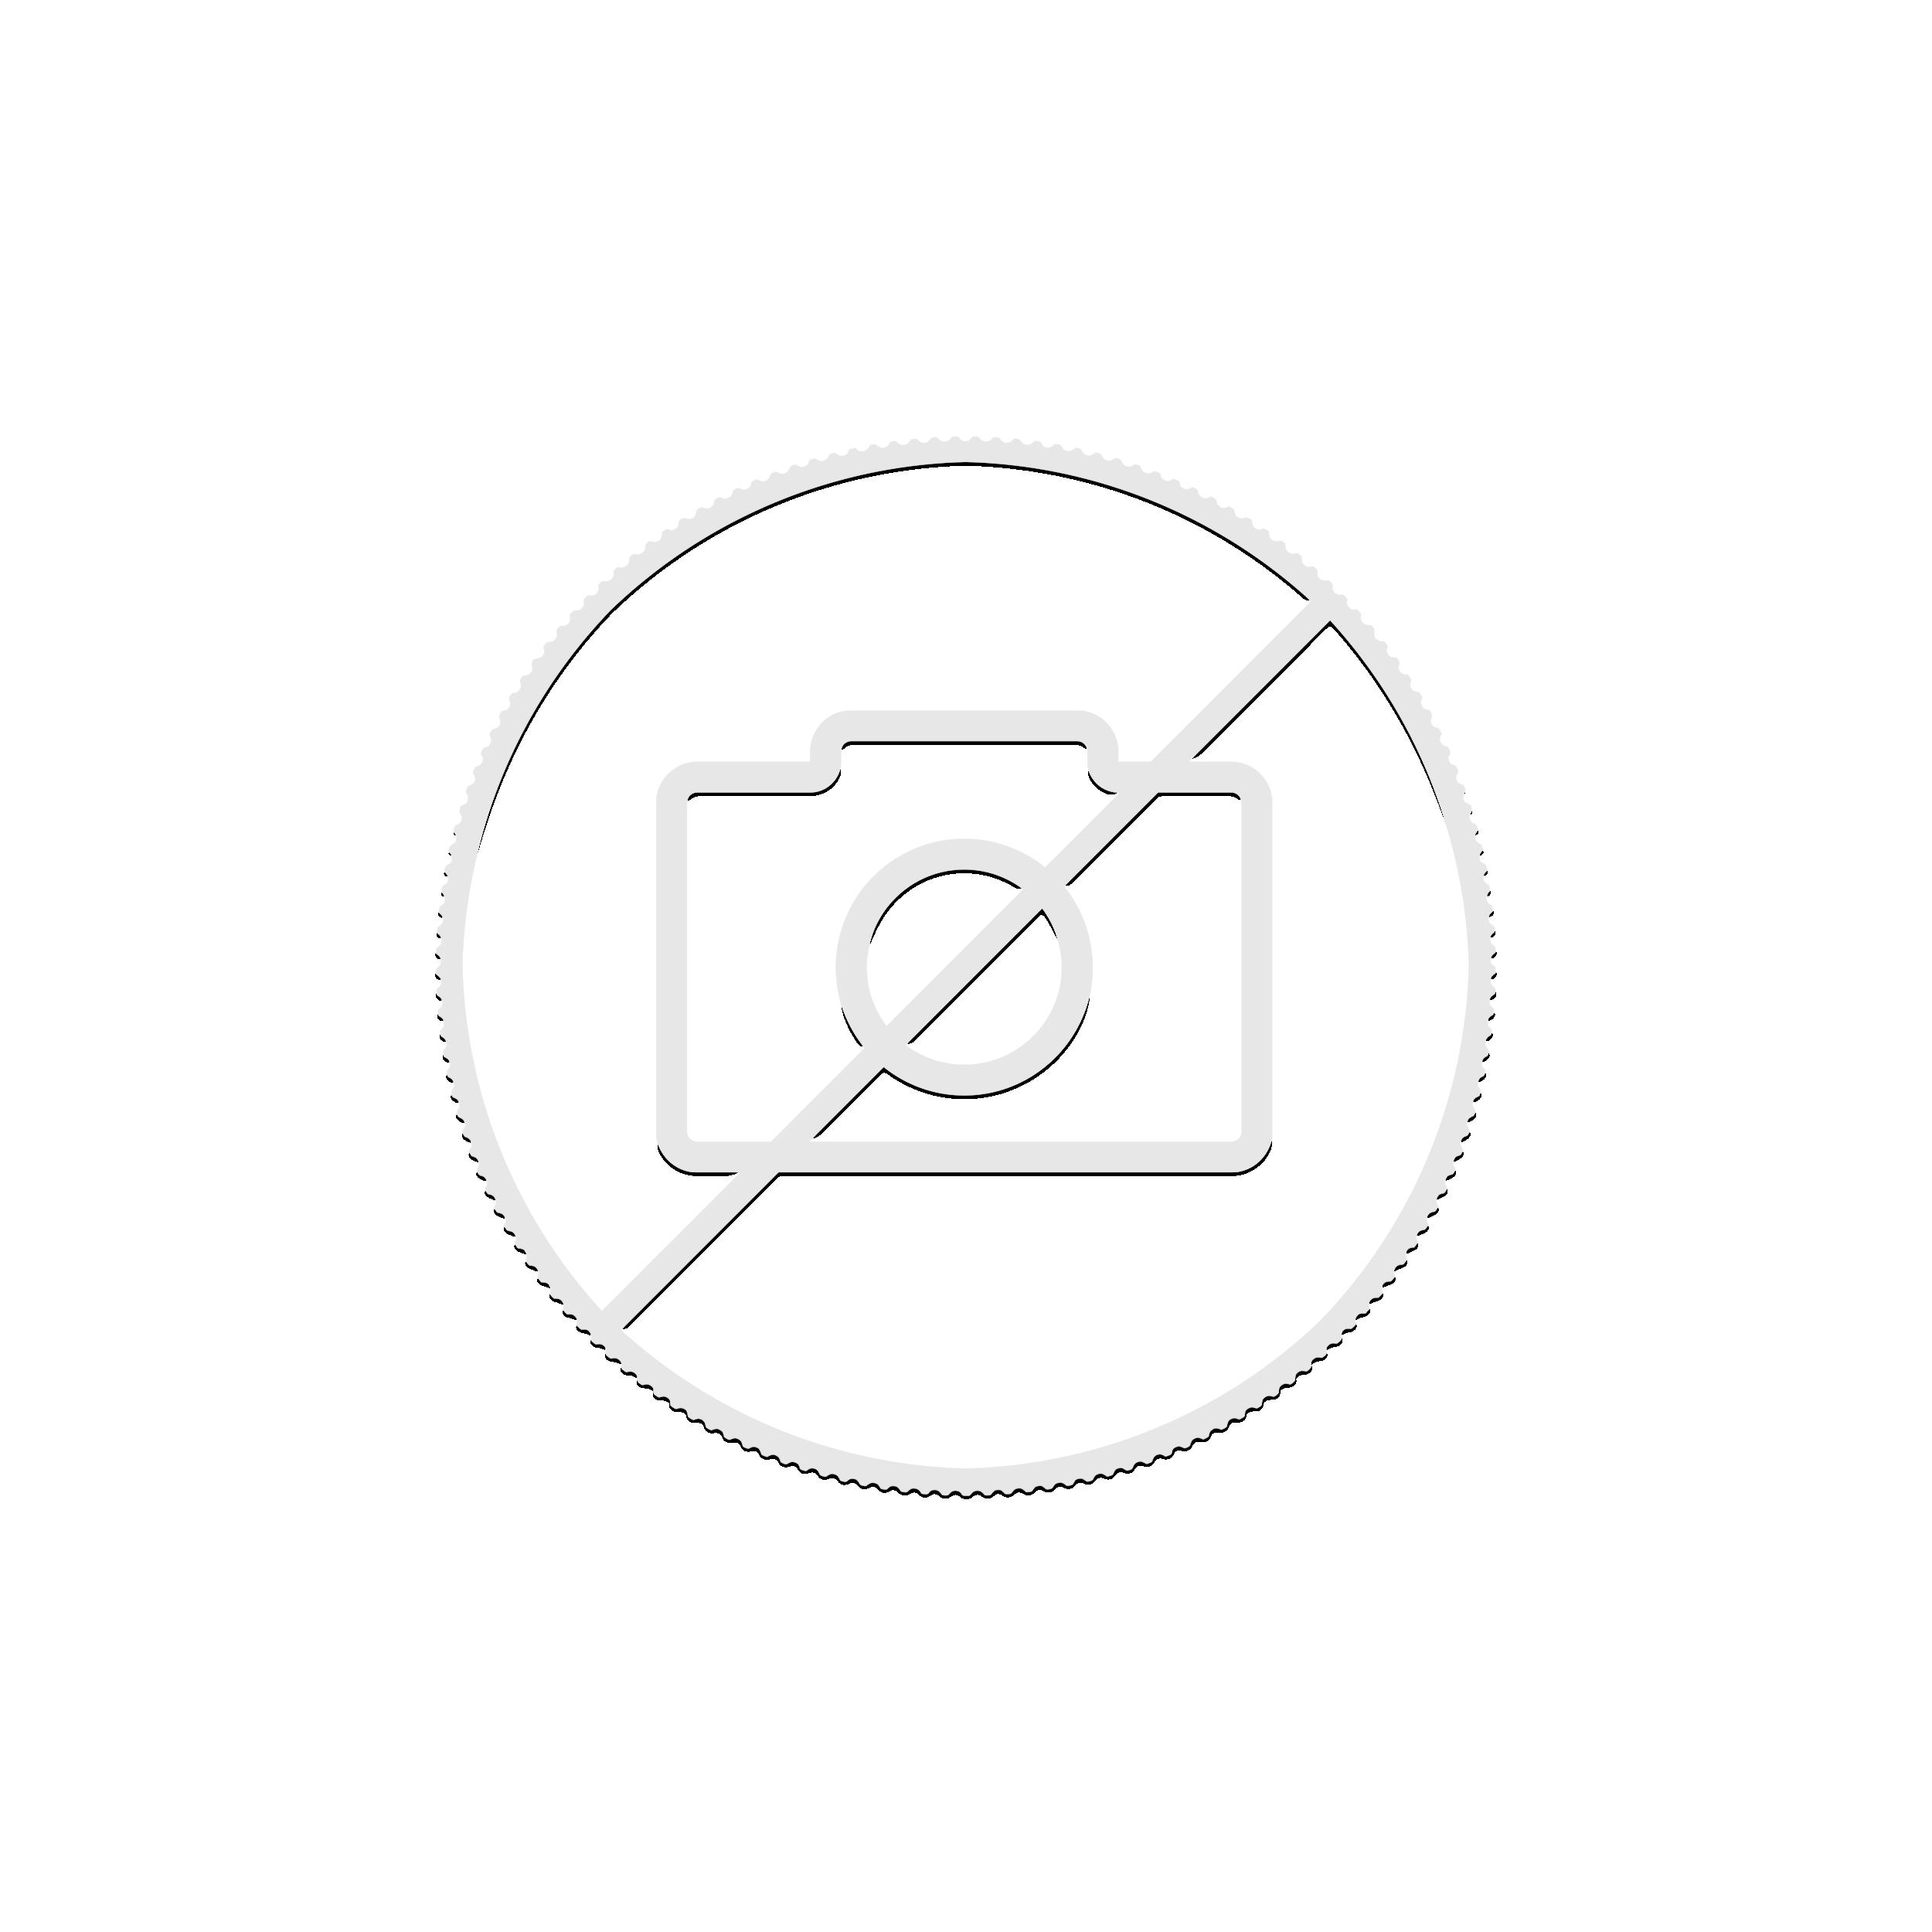 1 Kilo gouden munt Kangaroo 2018